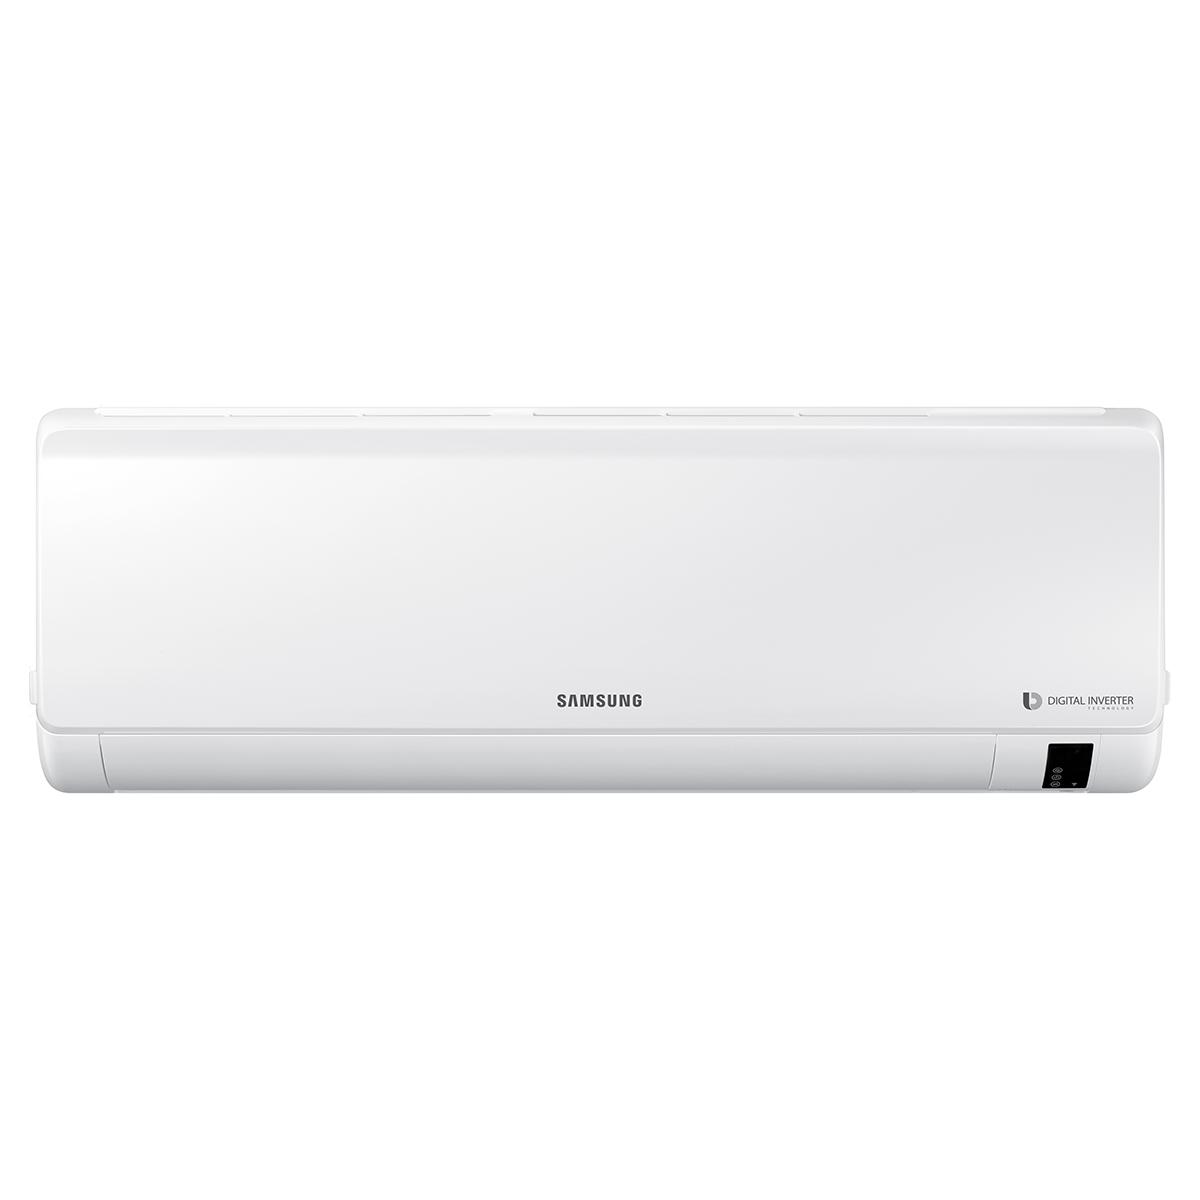 Samsung 1 Ton 3 Star Inverter Split AC (Copper Condenser, AR12TV3HFWK, White)_1